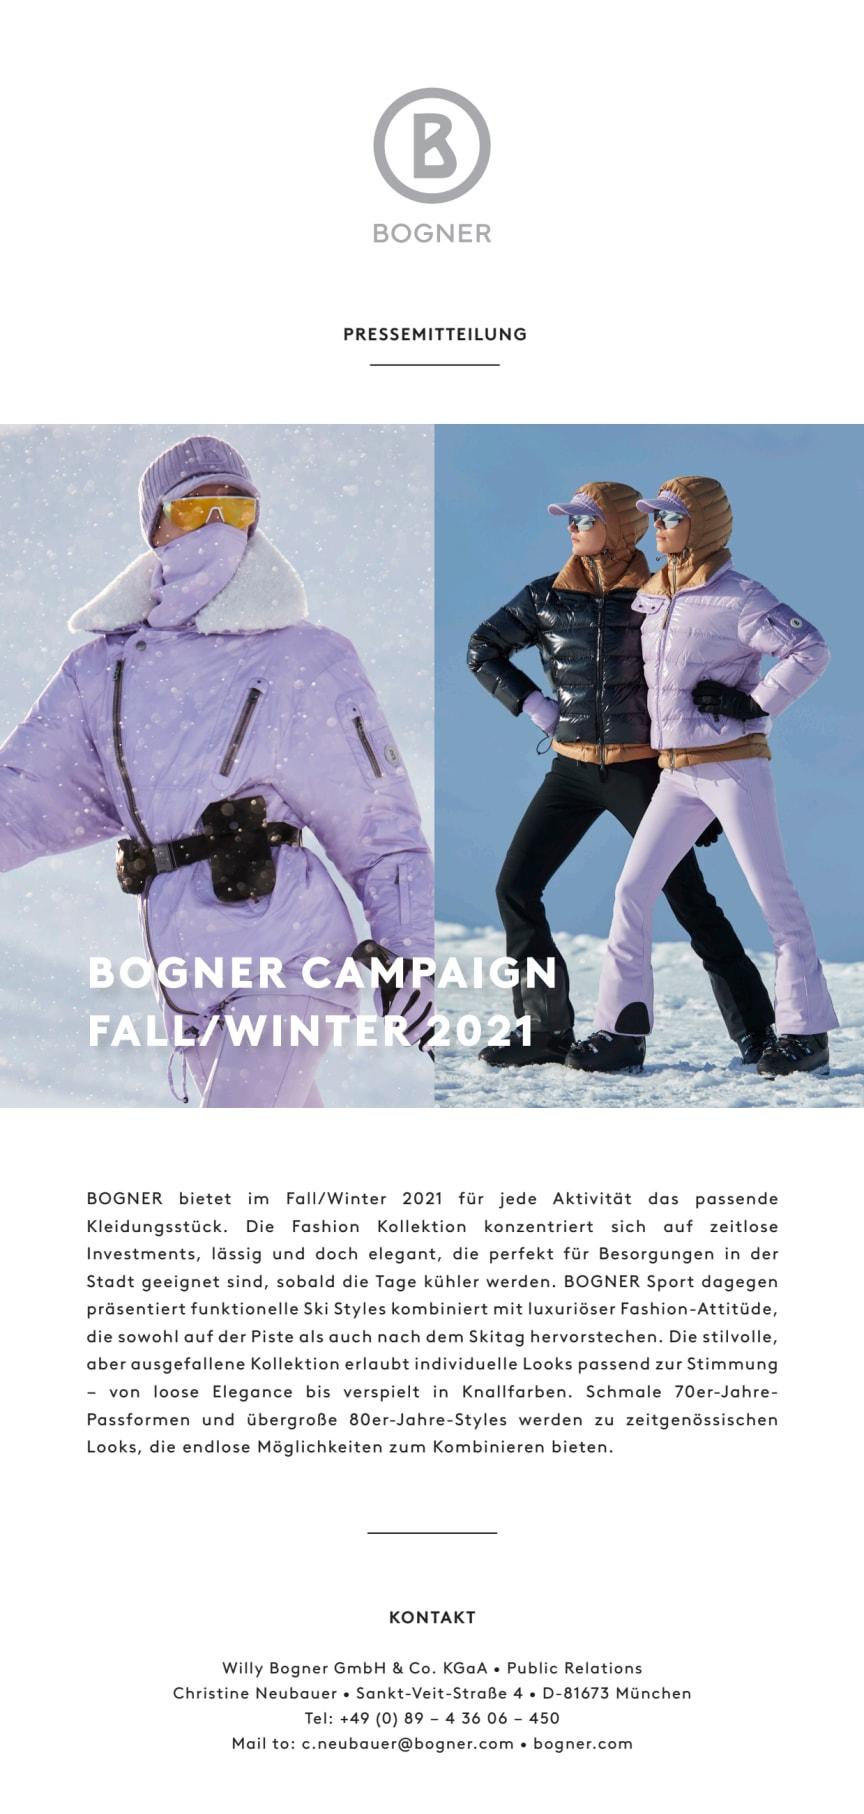 BOGNER Campaign Fall/Winter 2021